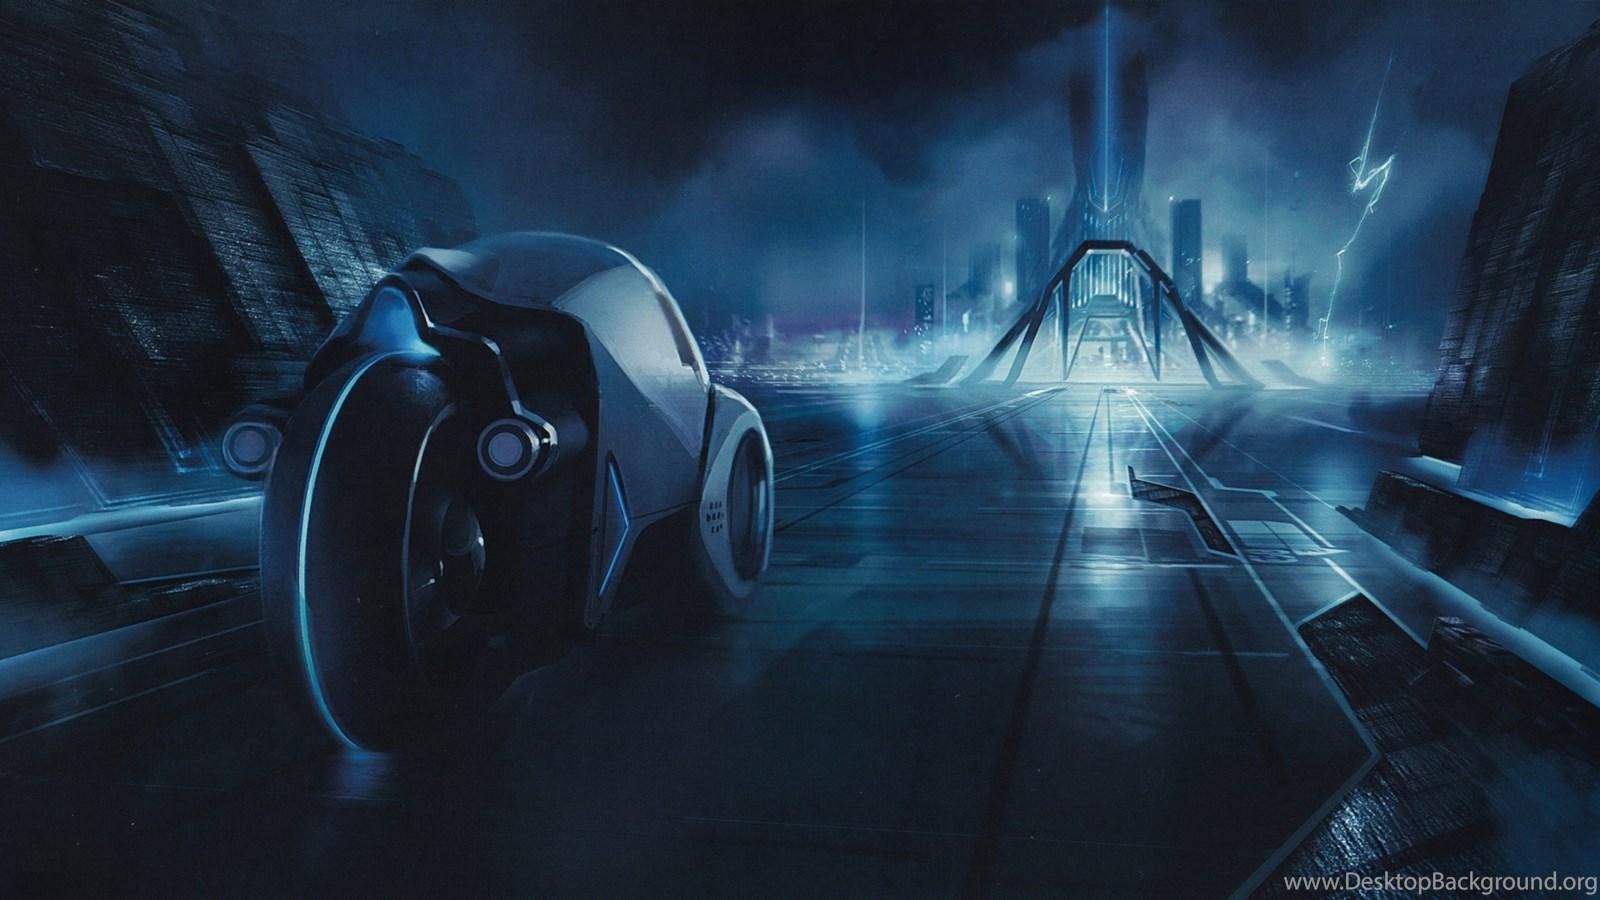 Tron Legacy 4K Ultra Hd Charming Wallpapers Free HD